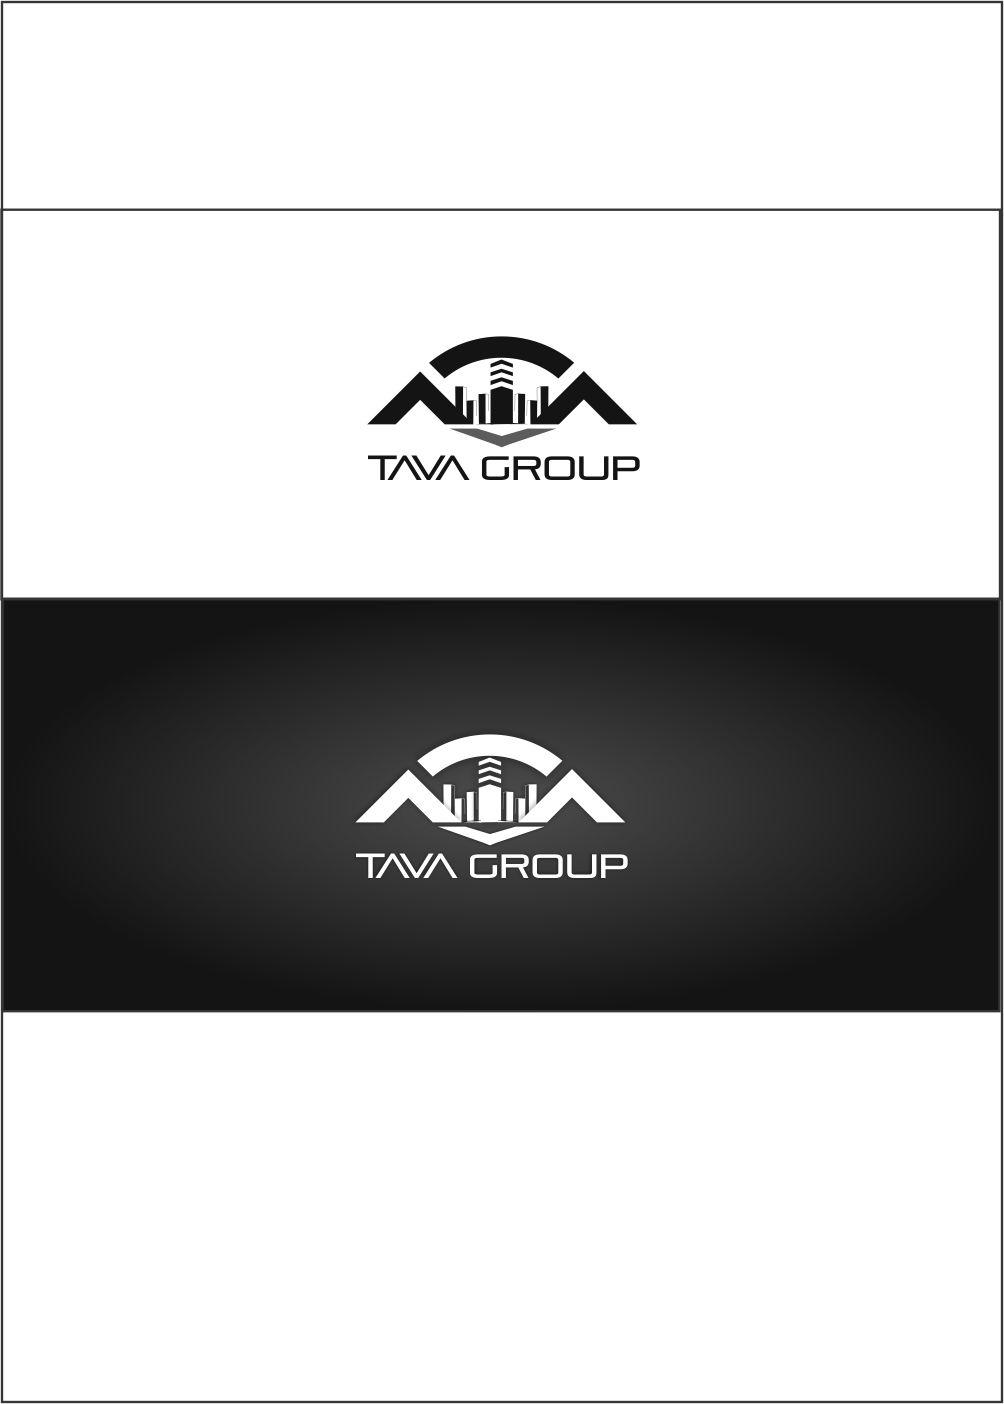 Logo Design by ian69 - Entry No. 260 in the Logo Design Contest Creative Logo Design for Tava Group.